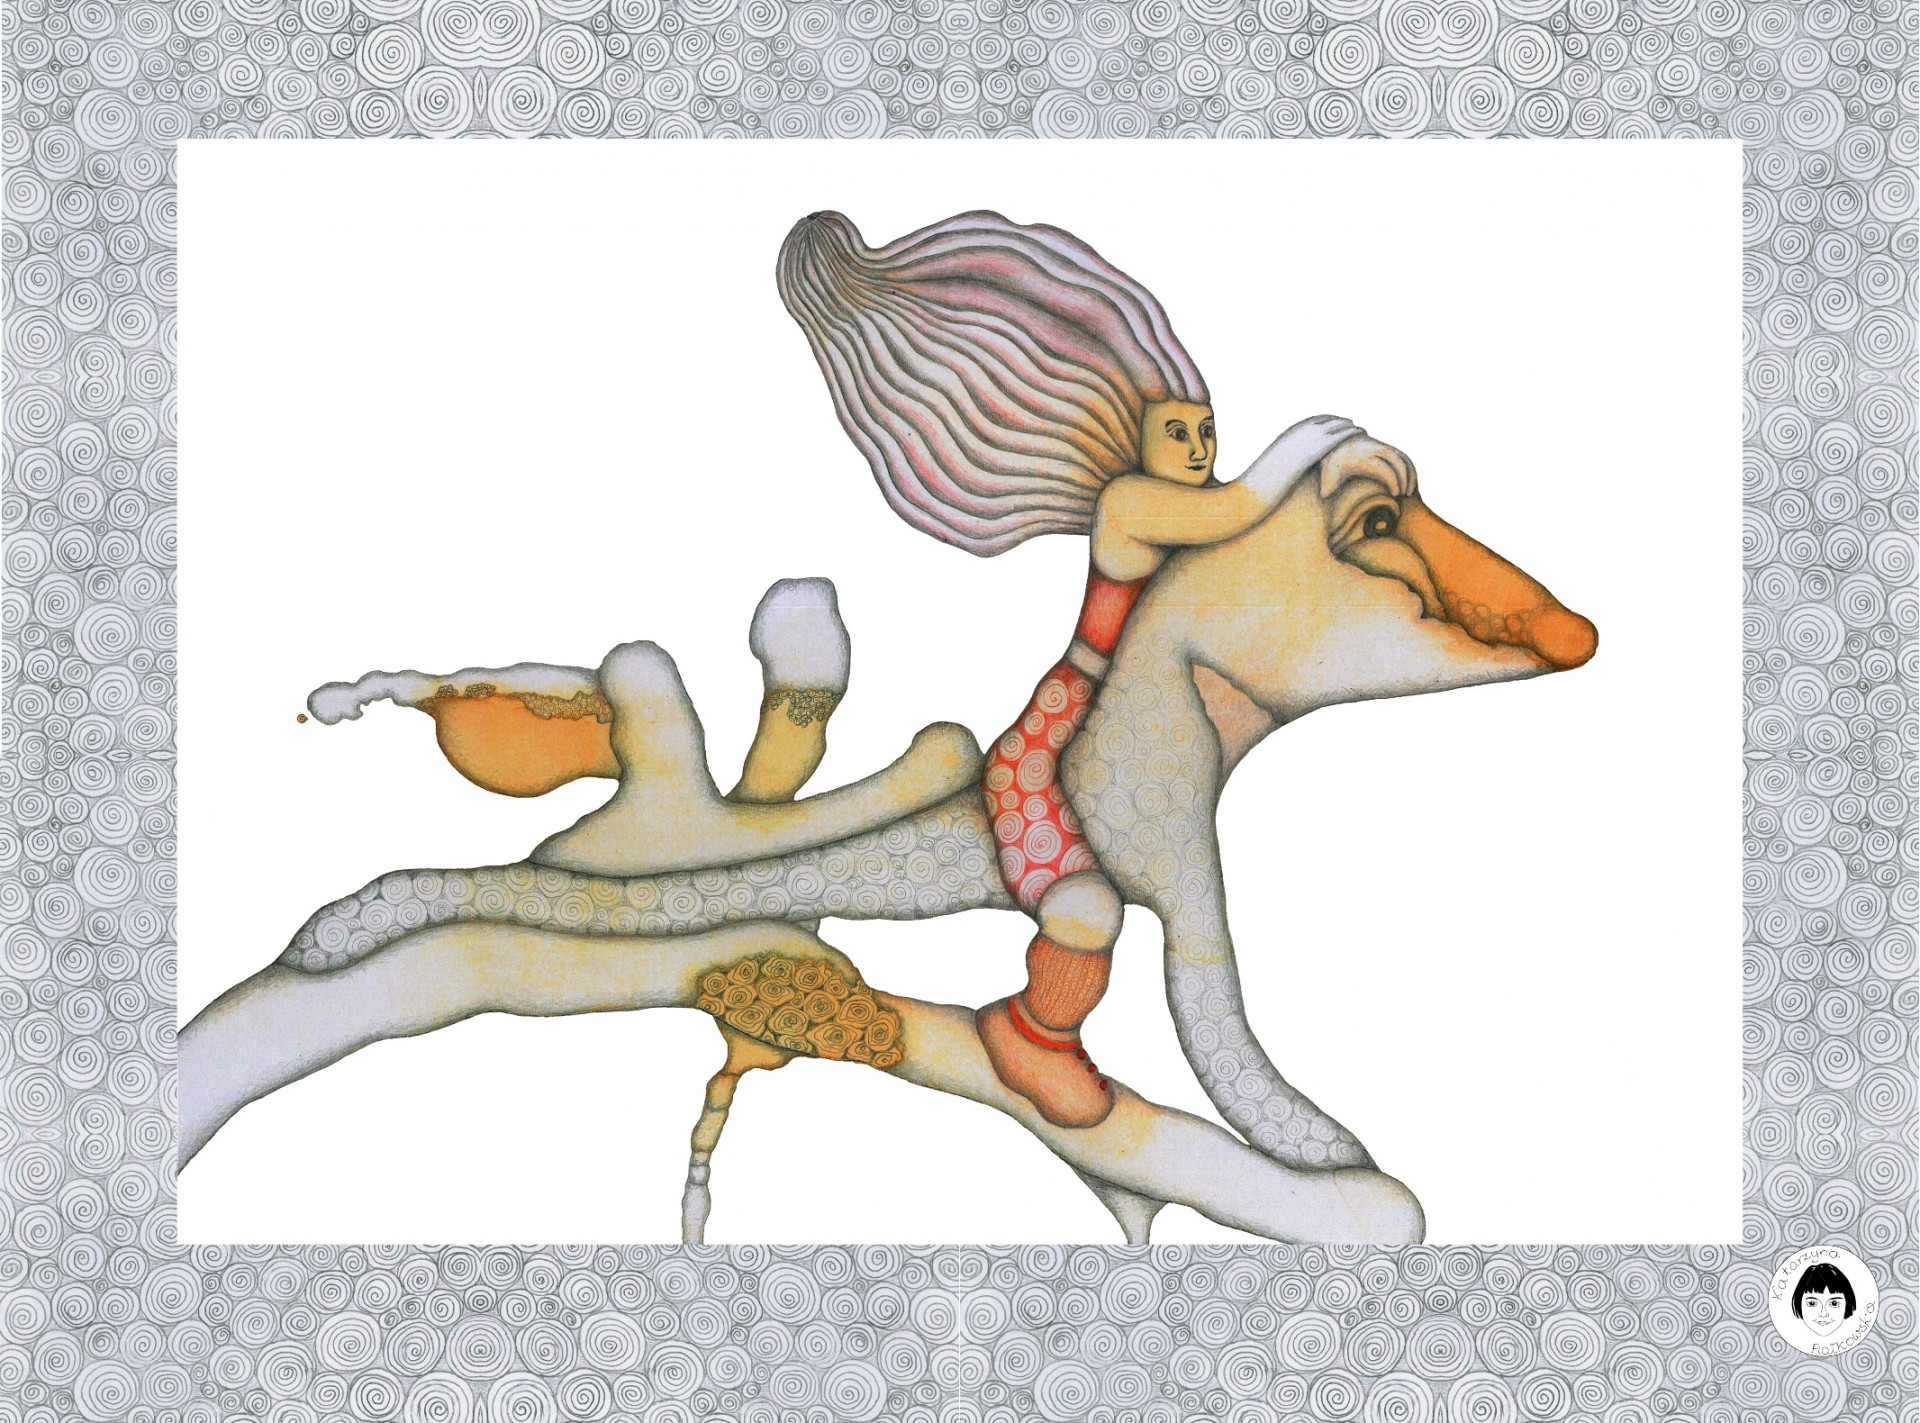 Baba i Jaszczur - plakat / reprodukcja